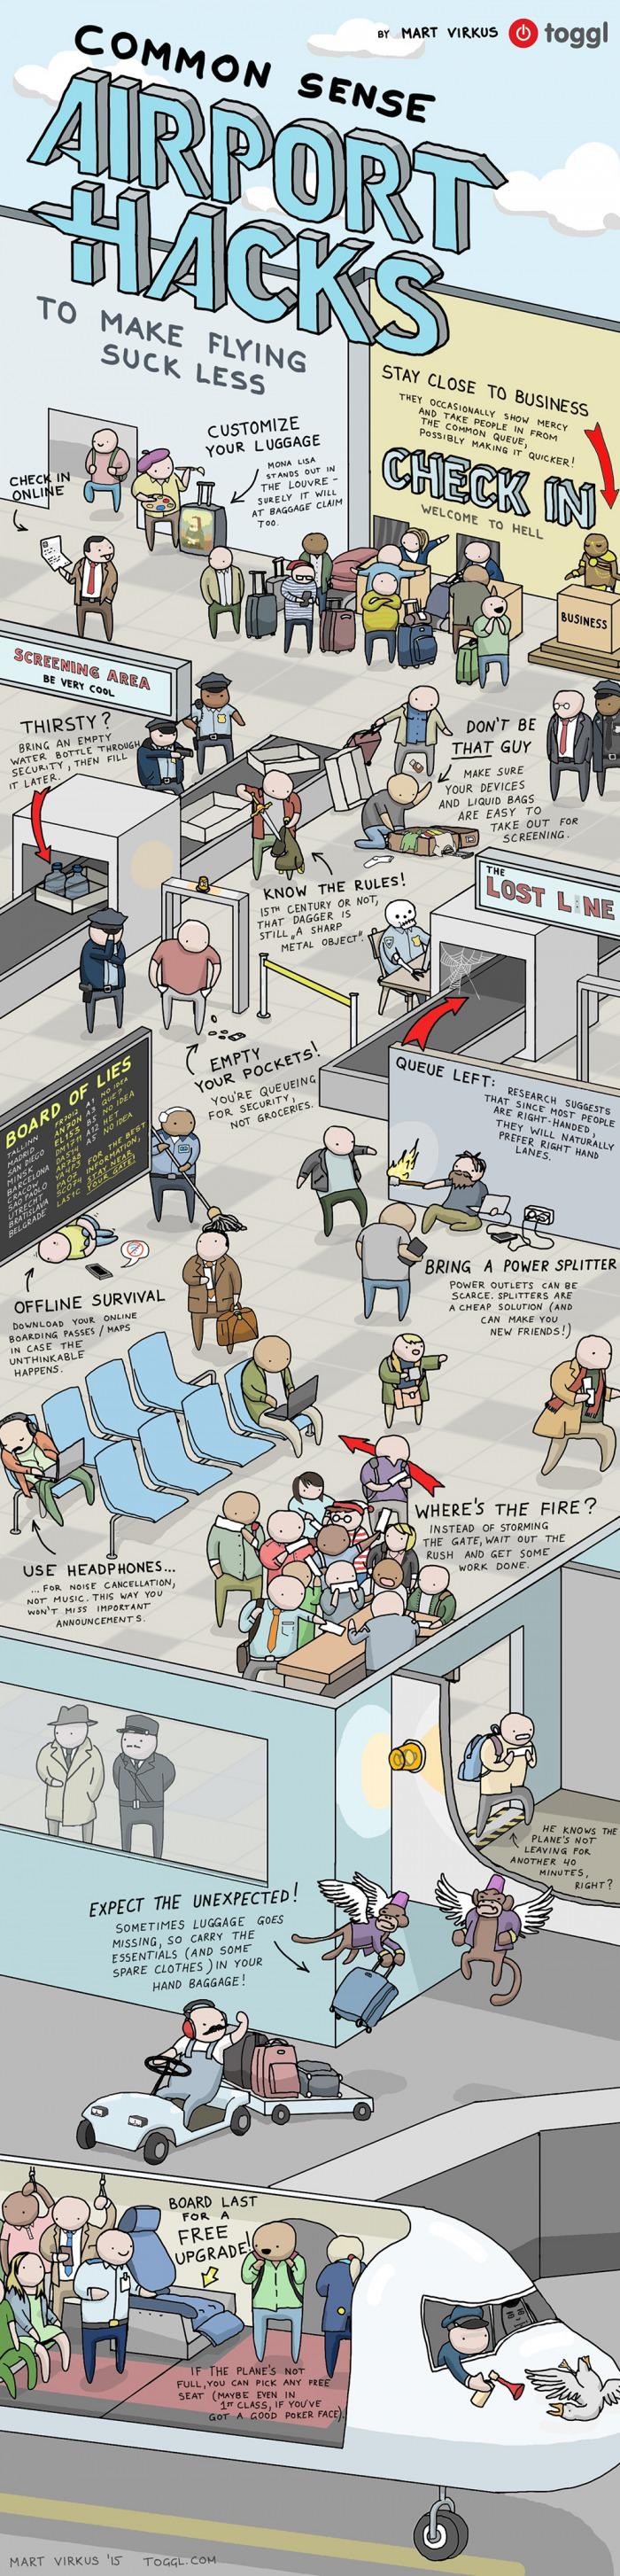 Airport Hacks That Make Flying A Lot More Fun